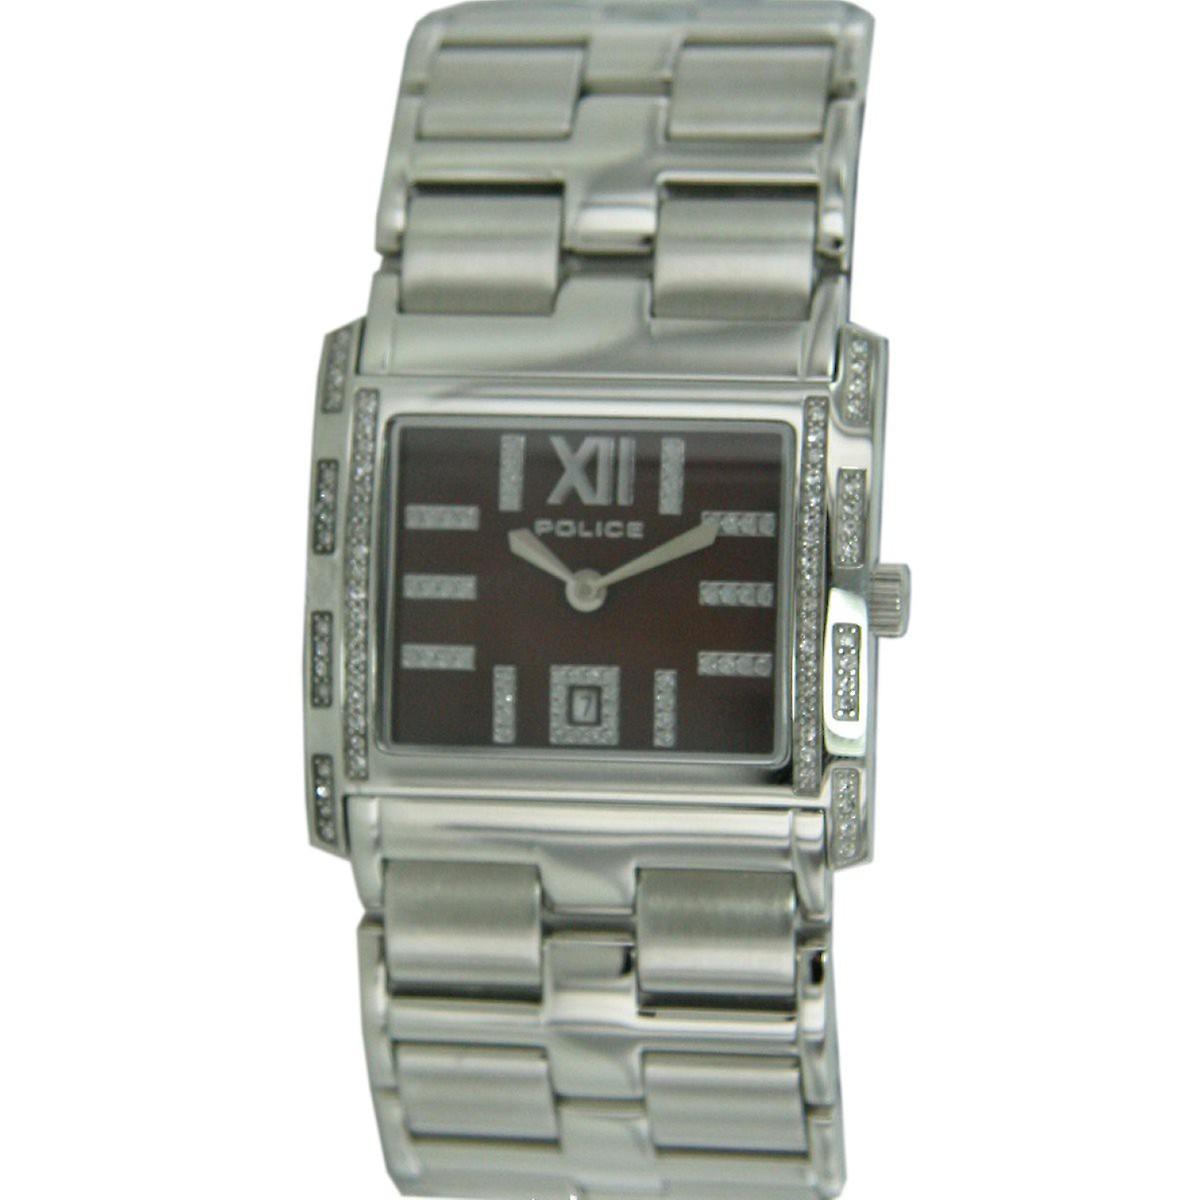 Police Damen Uhr Armbanduhr Edelstahl Analog Belle PL.11183BS/40M